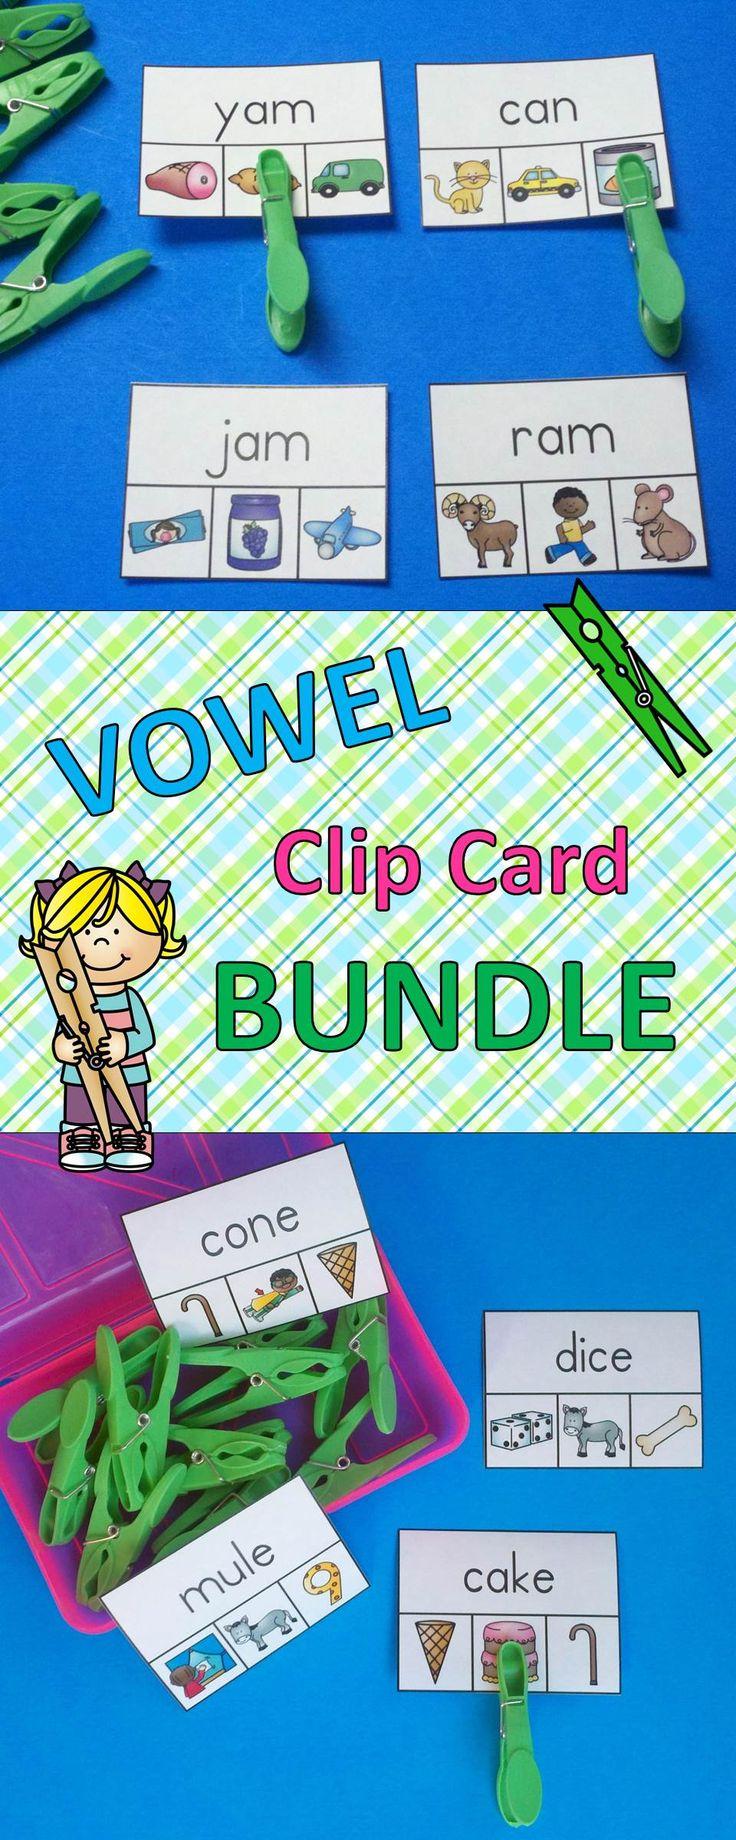 Phonics Fun for Your Little Learners!  This money saving bundle addresses long and short vowels as well as bossy R.  $ #bundle  #phonics #vowels  #kampkindergarten #bossyR  #longvowels #shortvowels  https://www.teacherspayteachers.com/Product/Vowel-WordPicture-Clip-Cards-Bundle-2266836